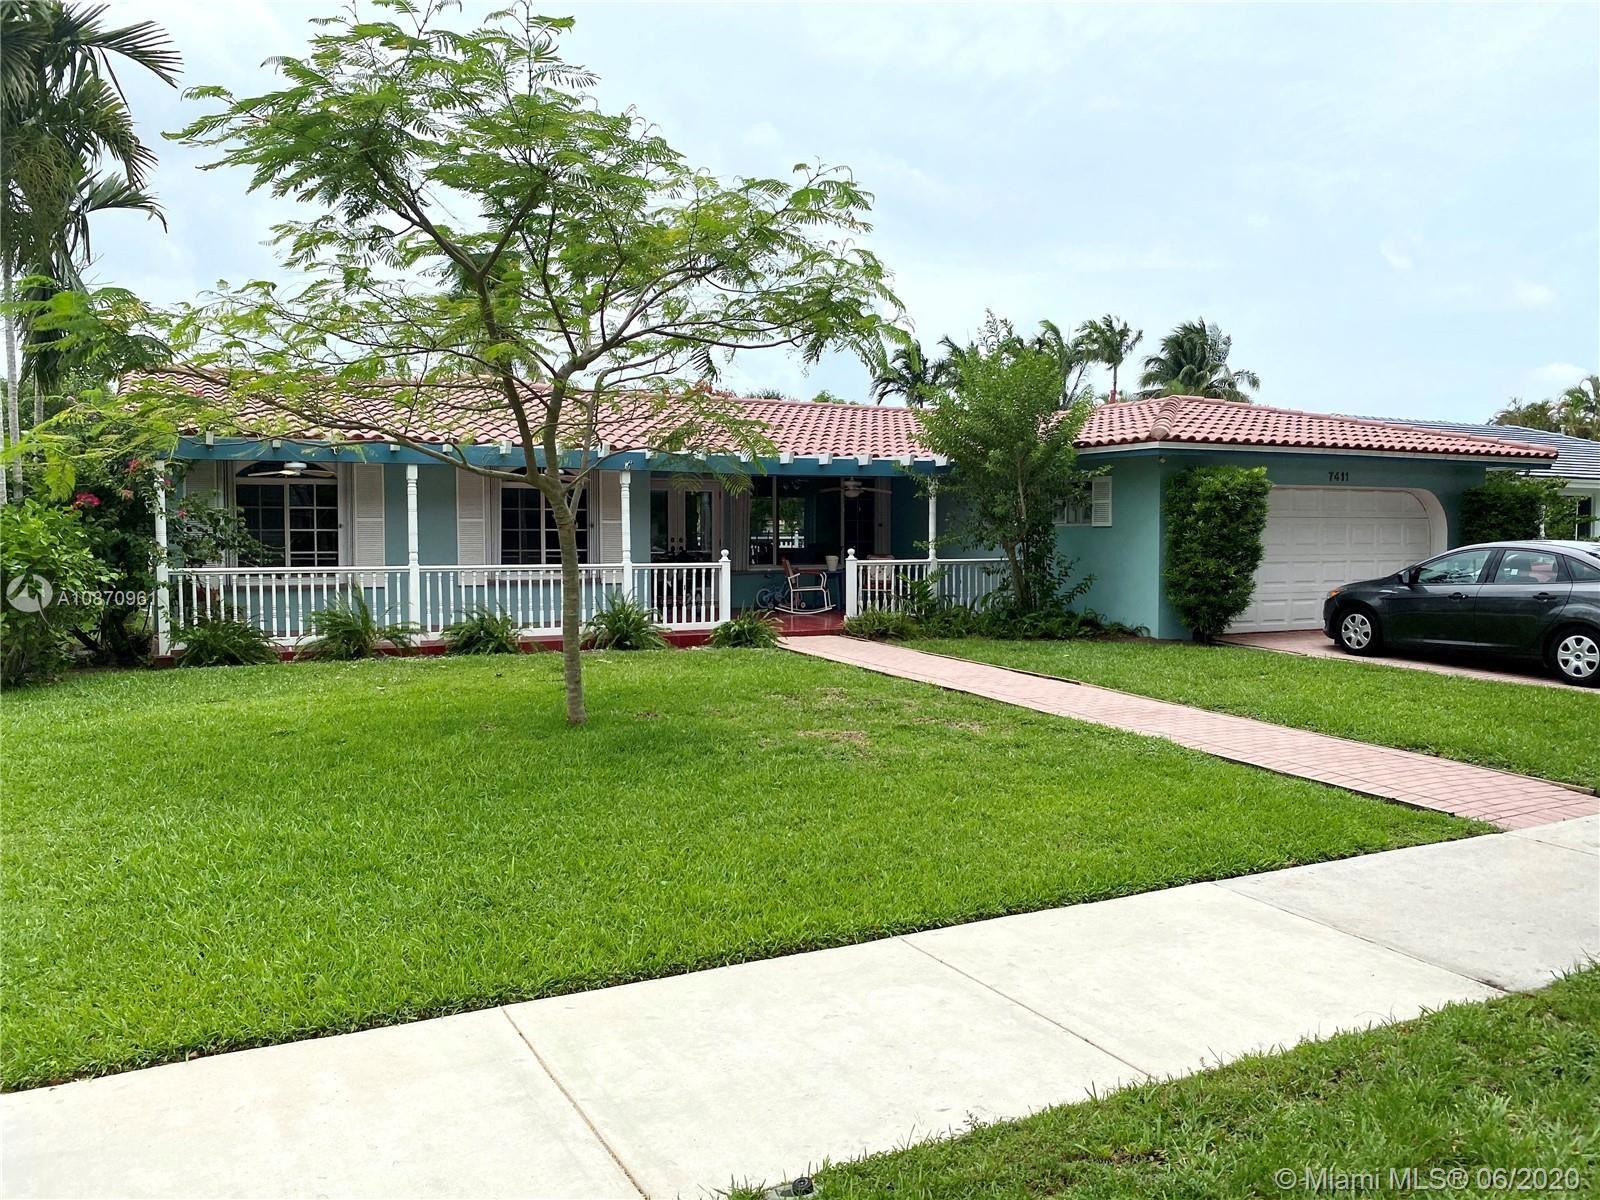 7411 Sabal Dr, Miami Lakes, FL 33014 - #: A10870961